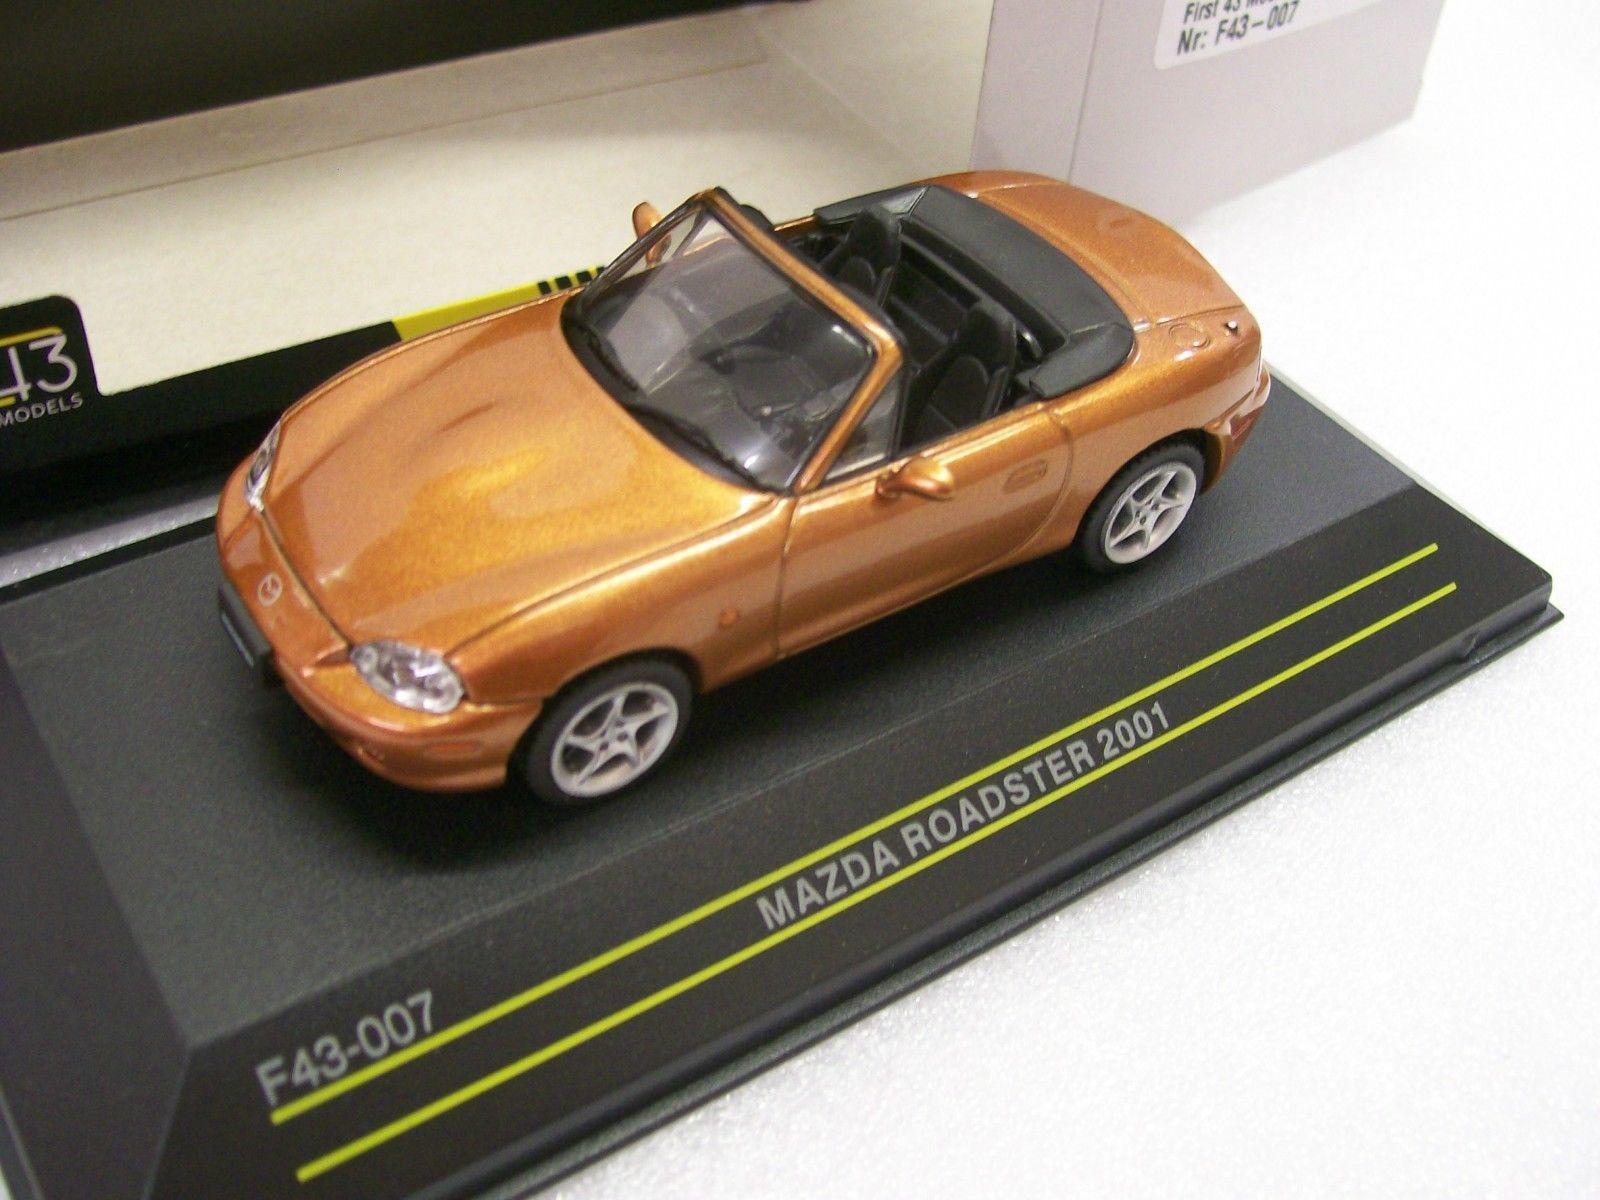 Mazda Mx-5 Roadster Closed 2015 White Black First43 1:43 F43-070 Model